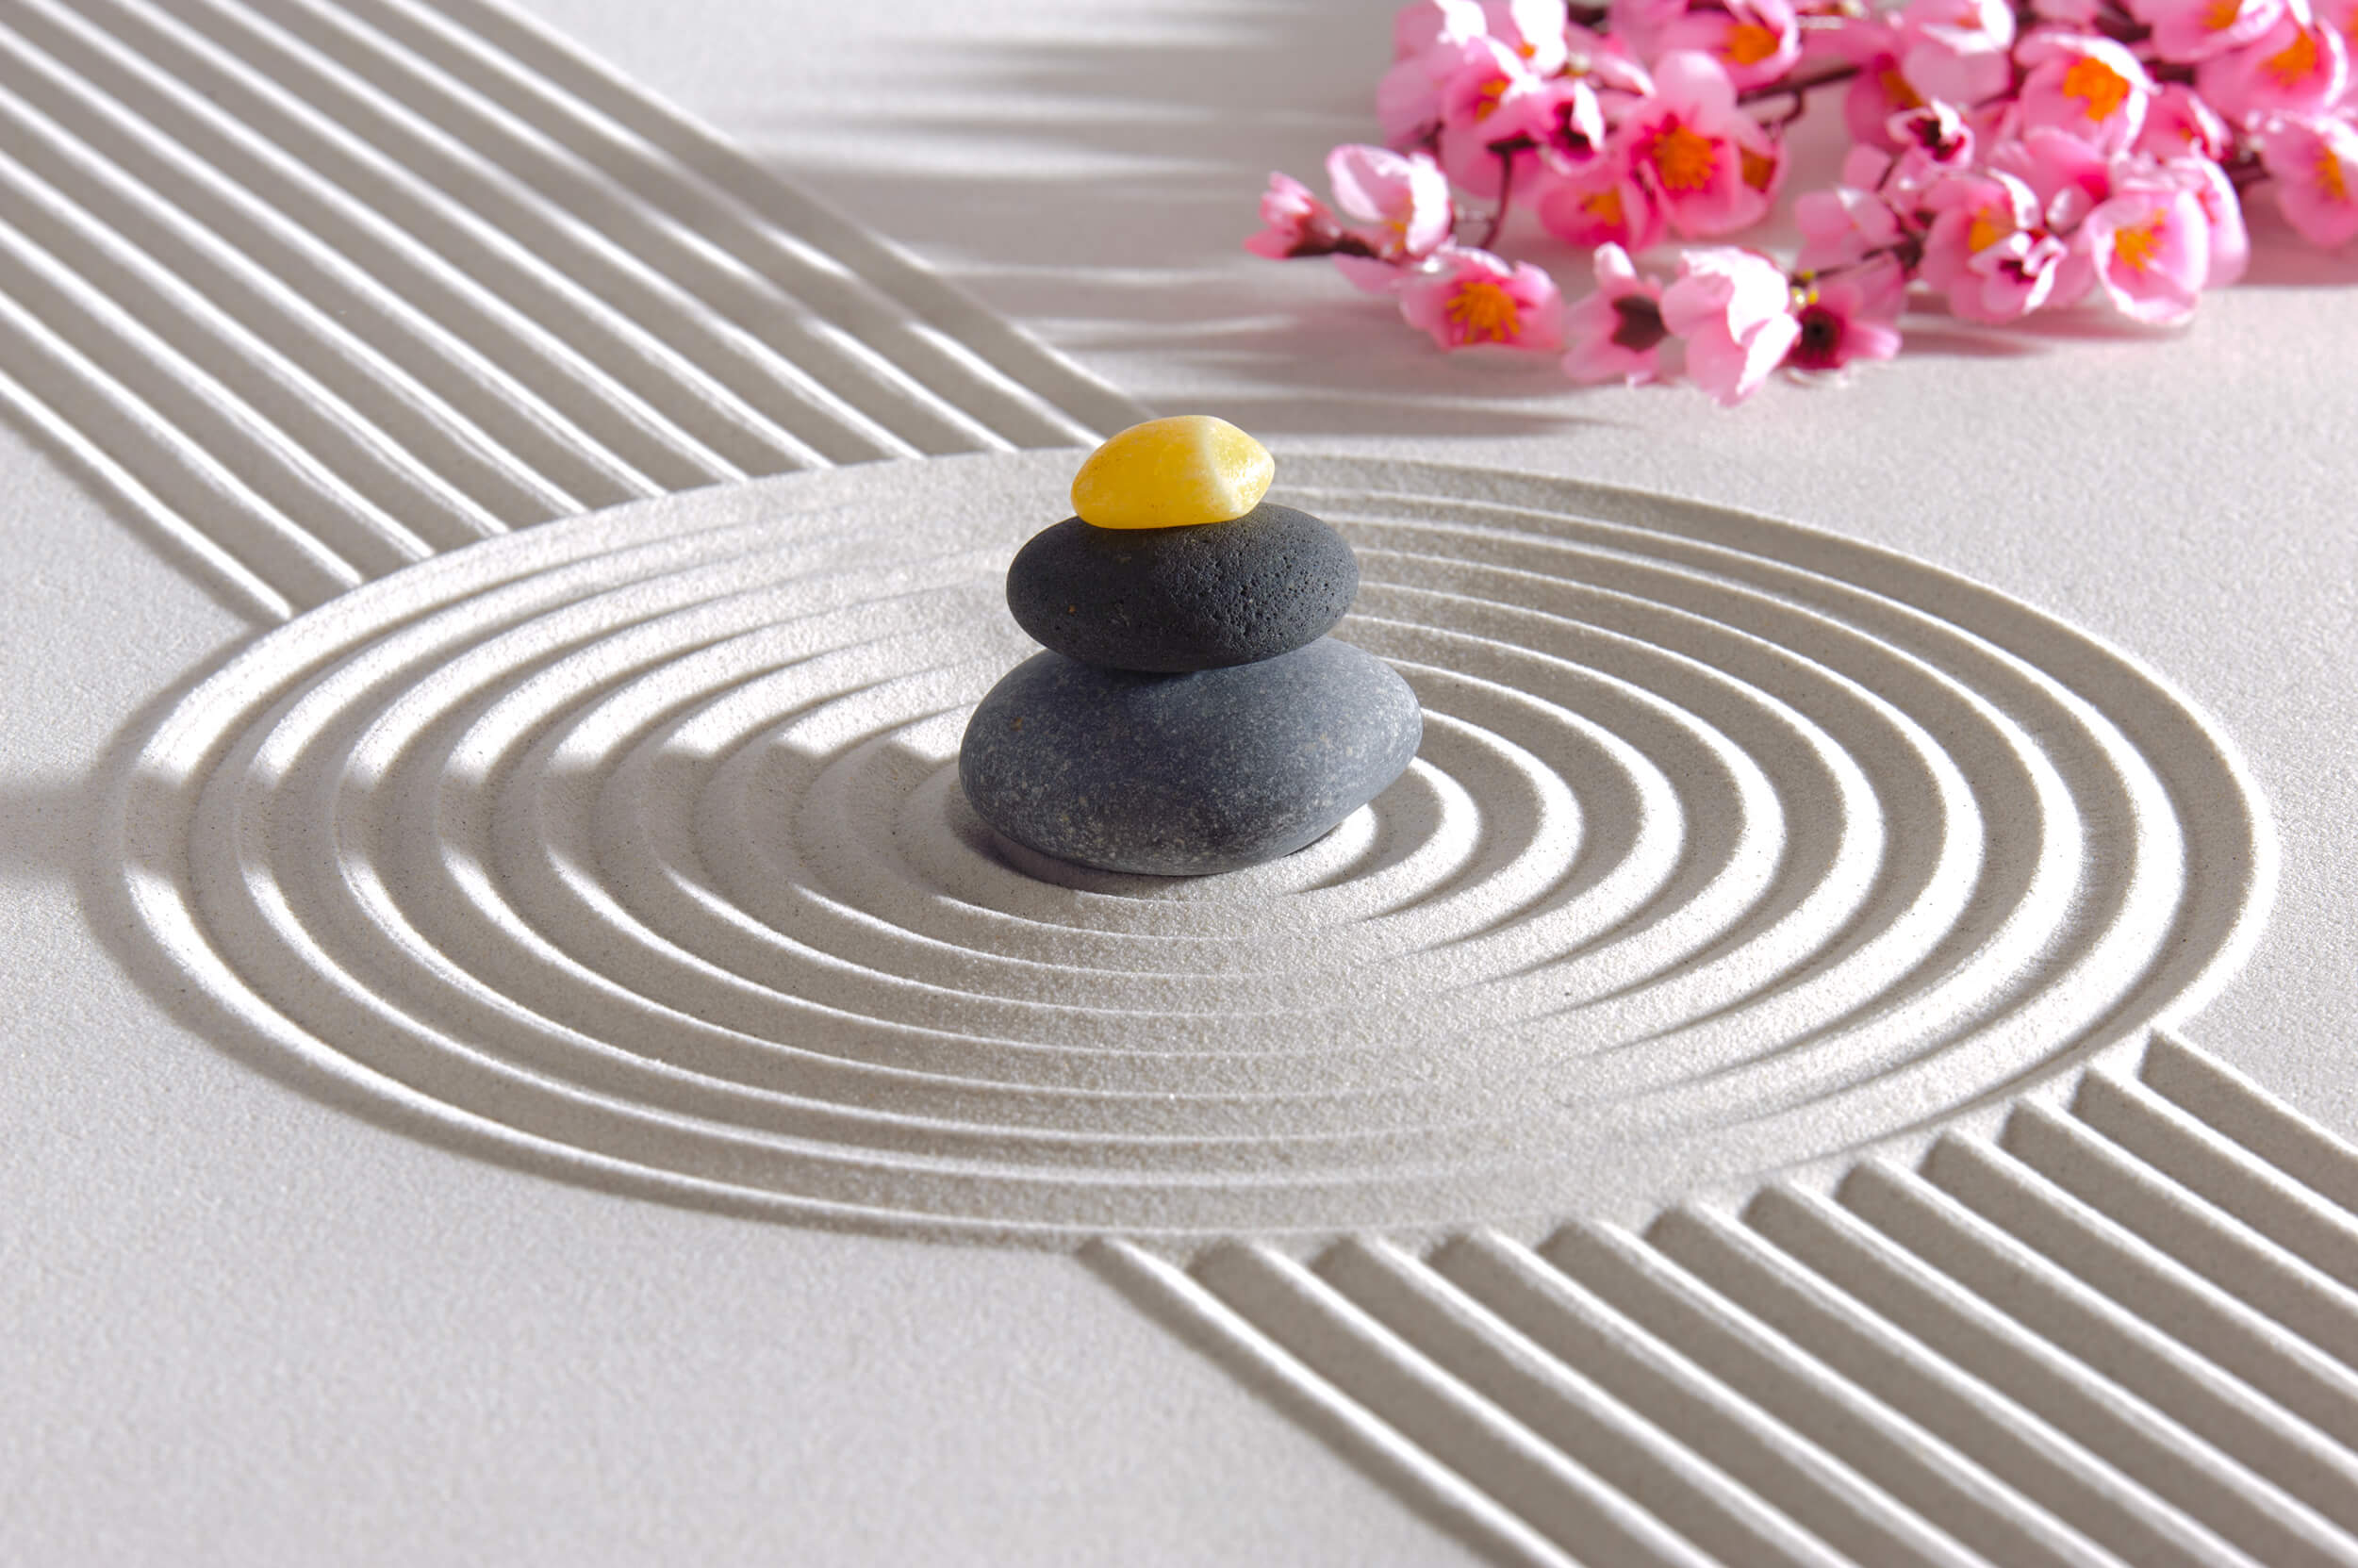 Steinturm - Akupunktur und Taping / Zen Garten | Hebamme Annette Herkommer